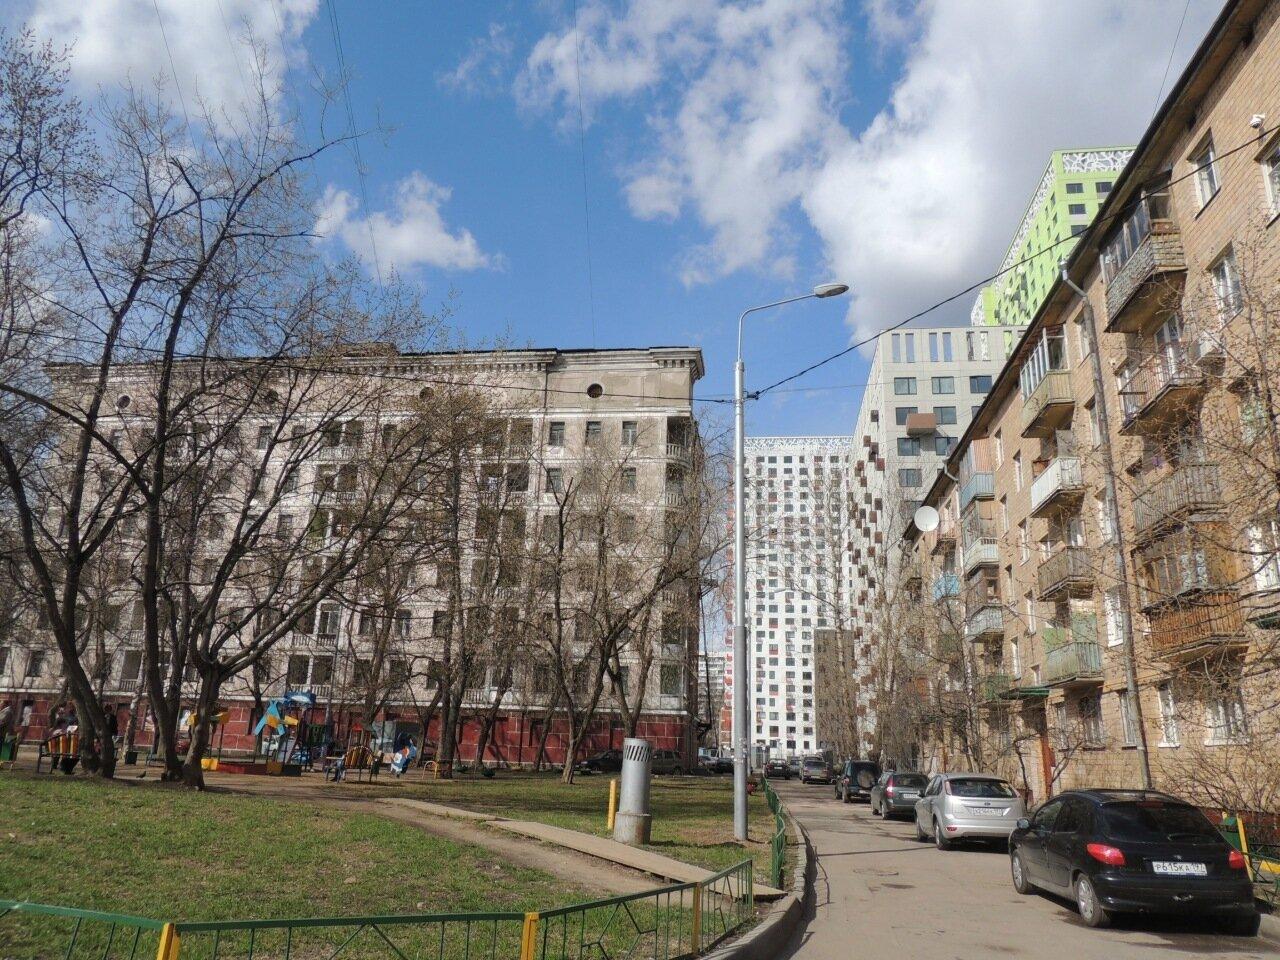 http://img-fotki.yandex.ru/get/5633/8217593.26/0_98c16_9b01b9c5_XXXL.jpg